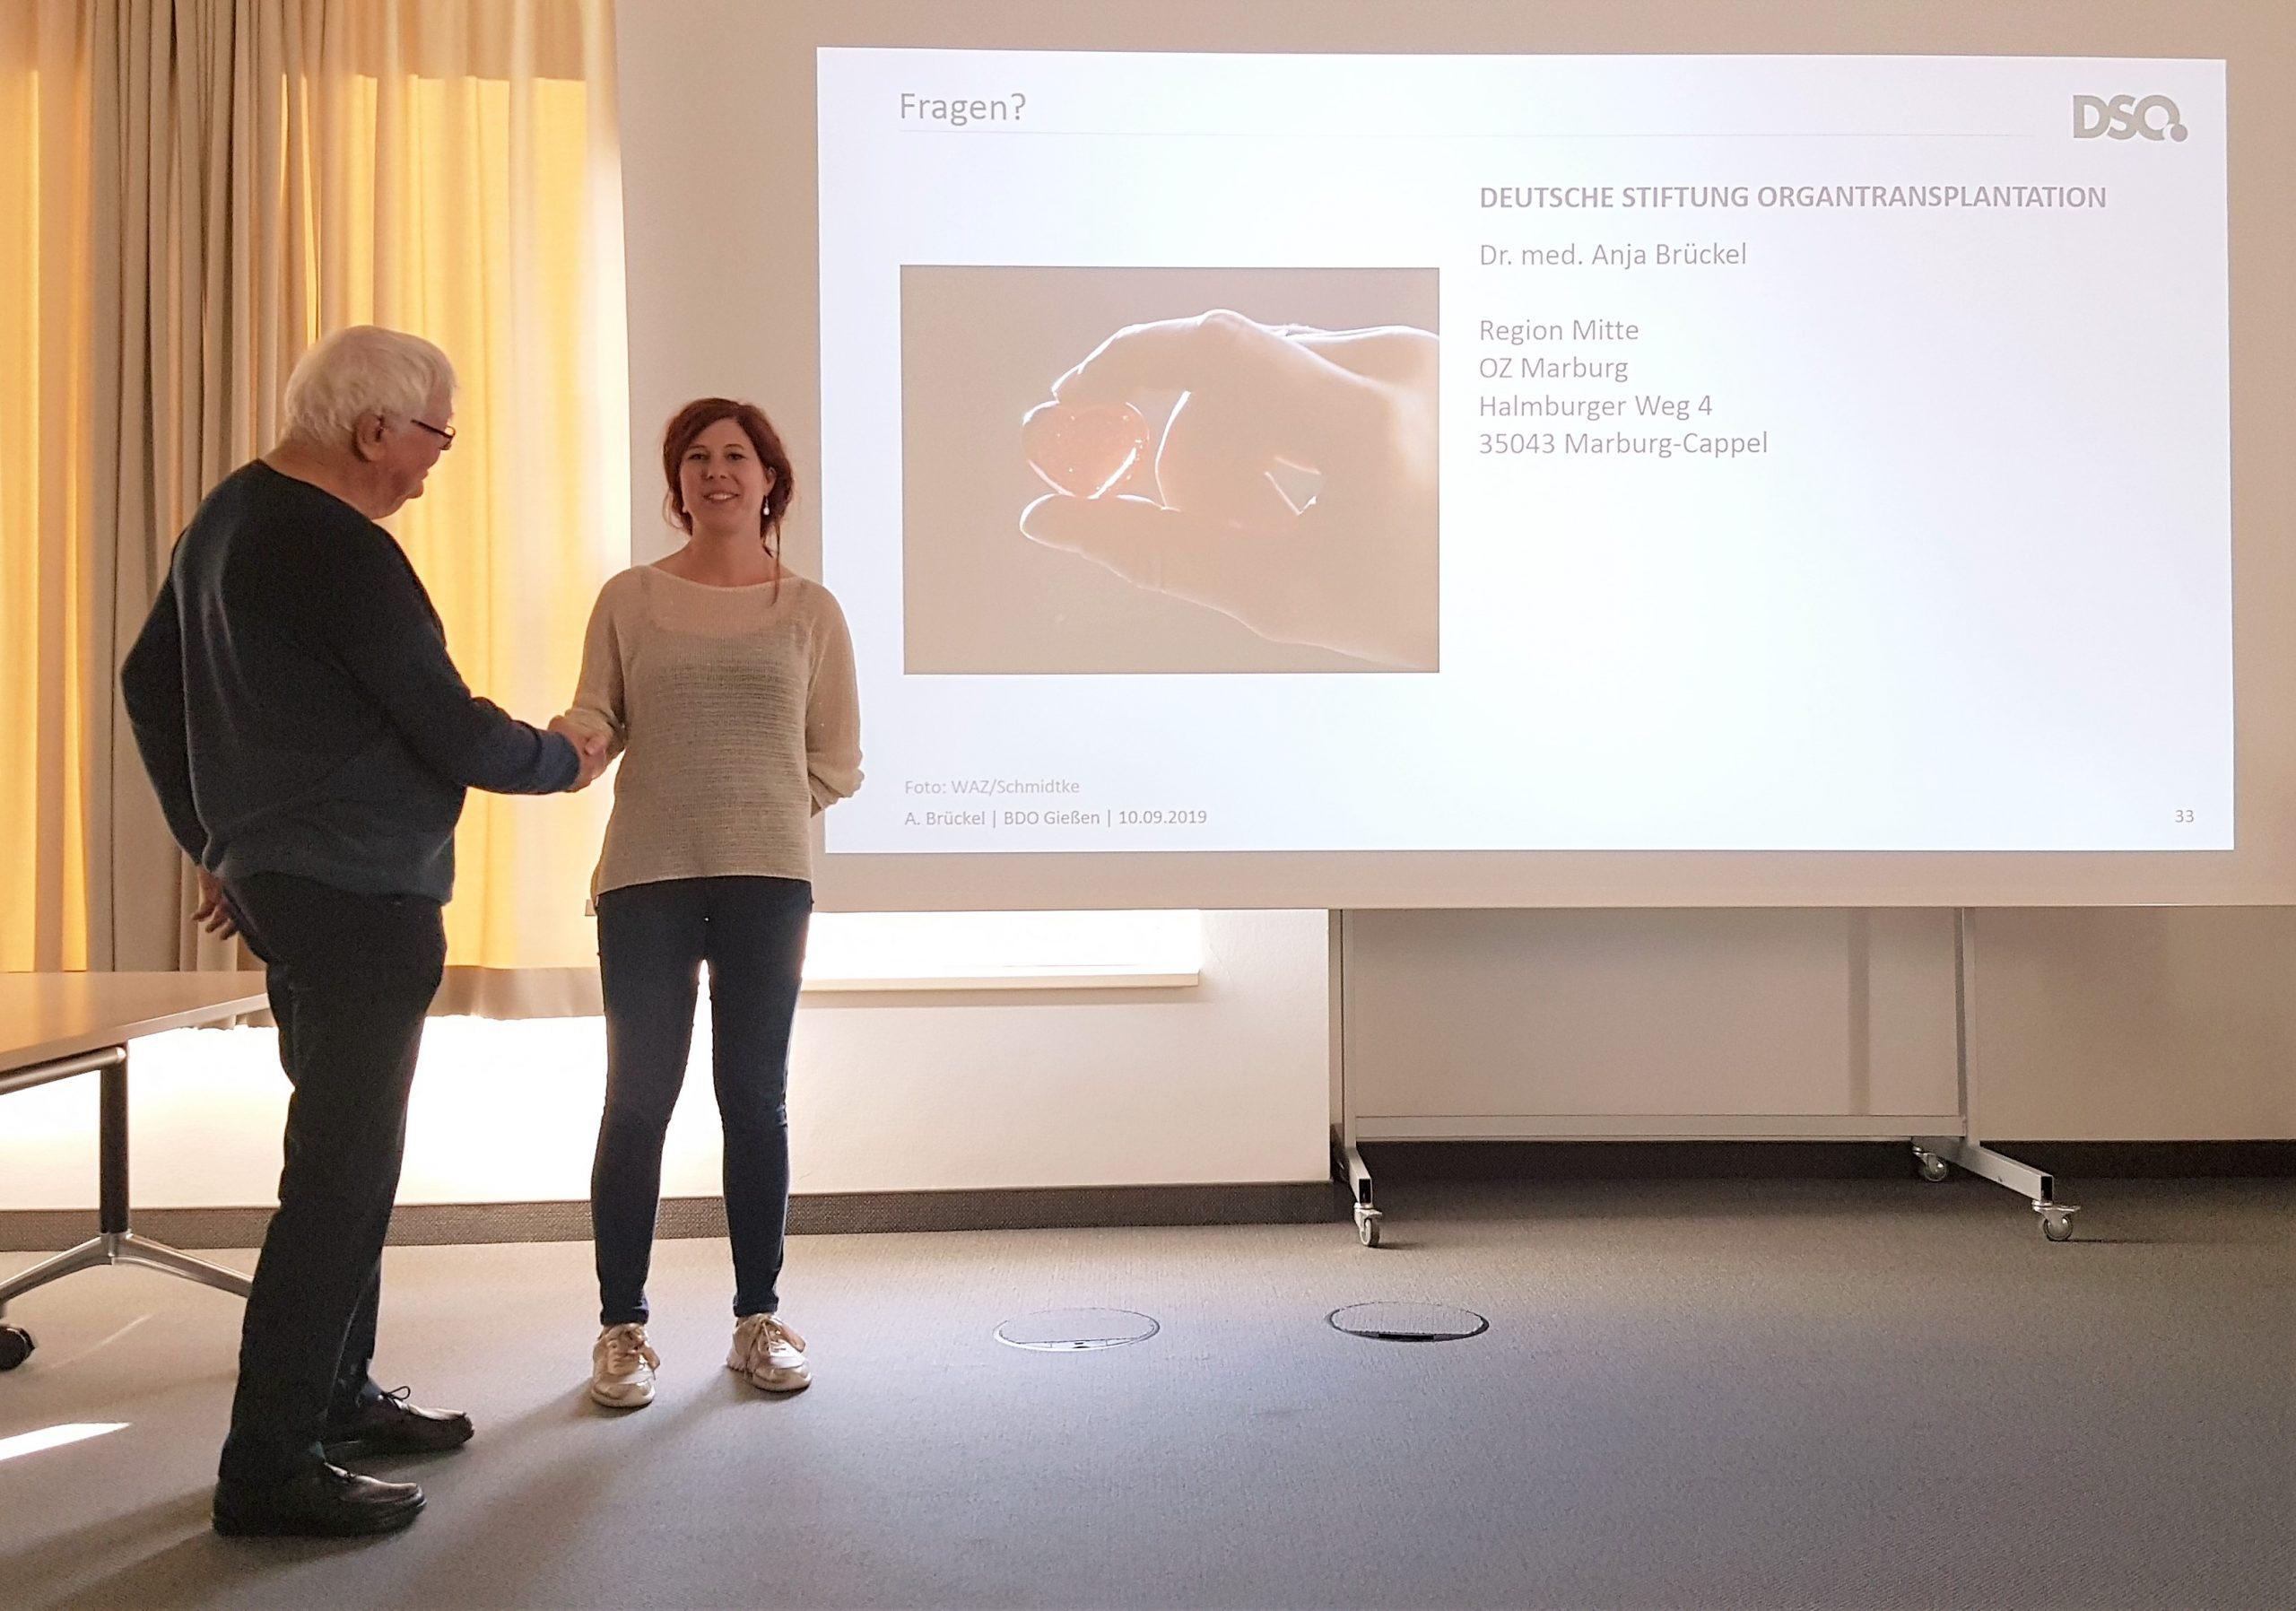 Rüdiger Volke im Gespräch mit Frau Dr. Anja Brückel